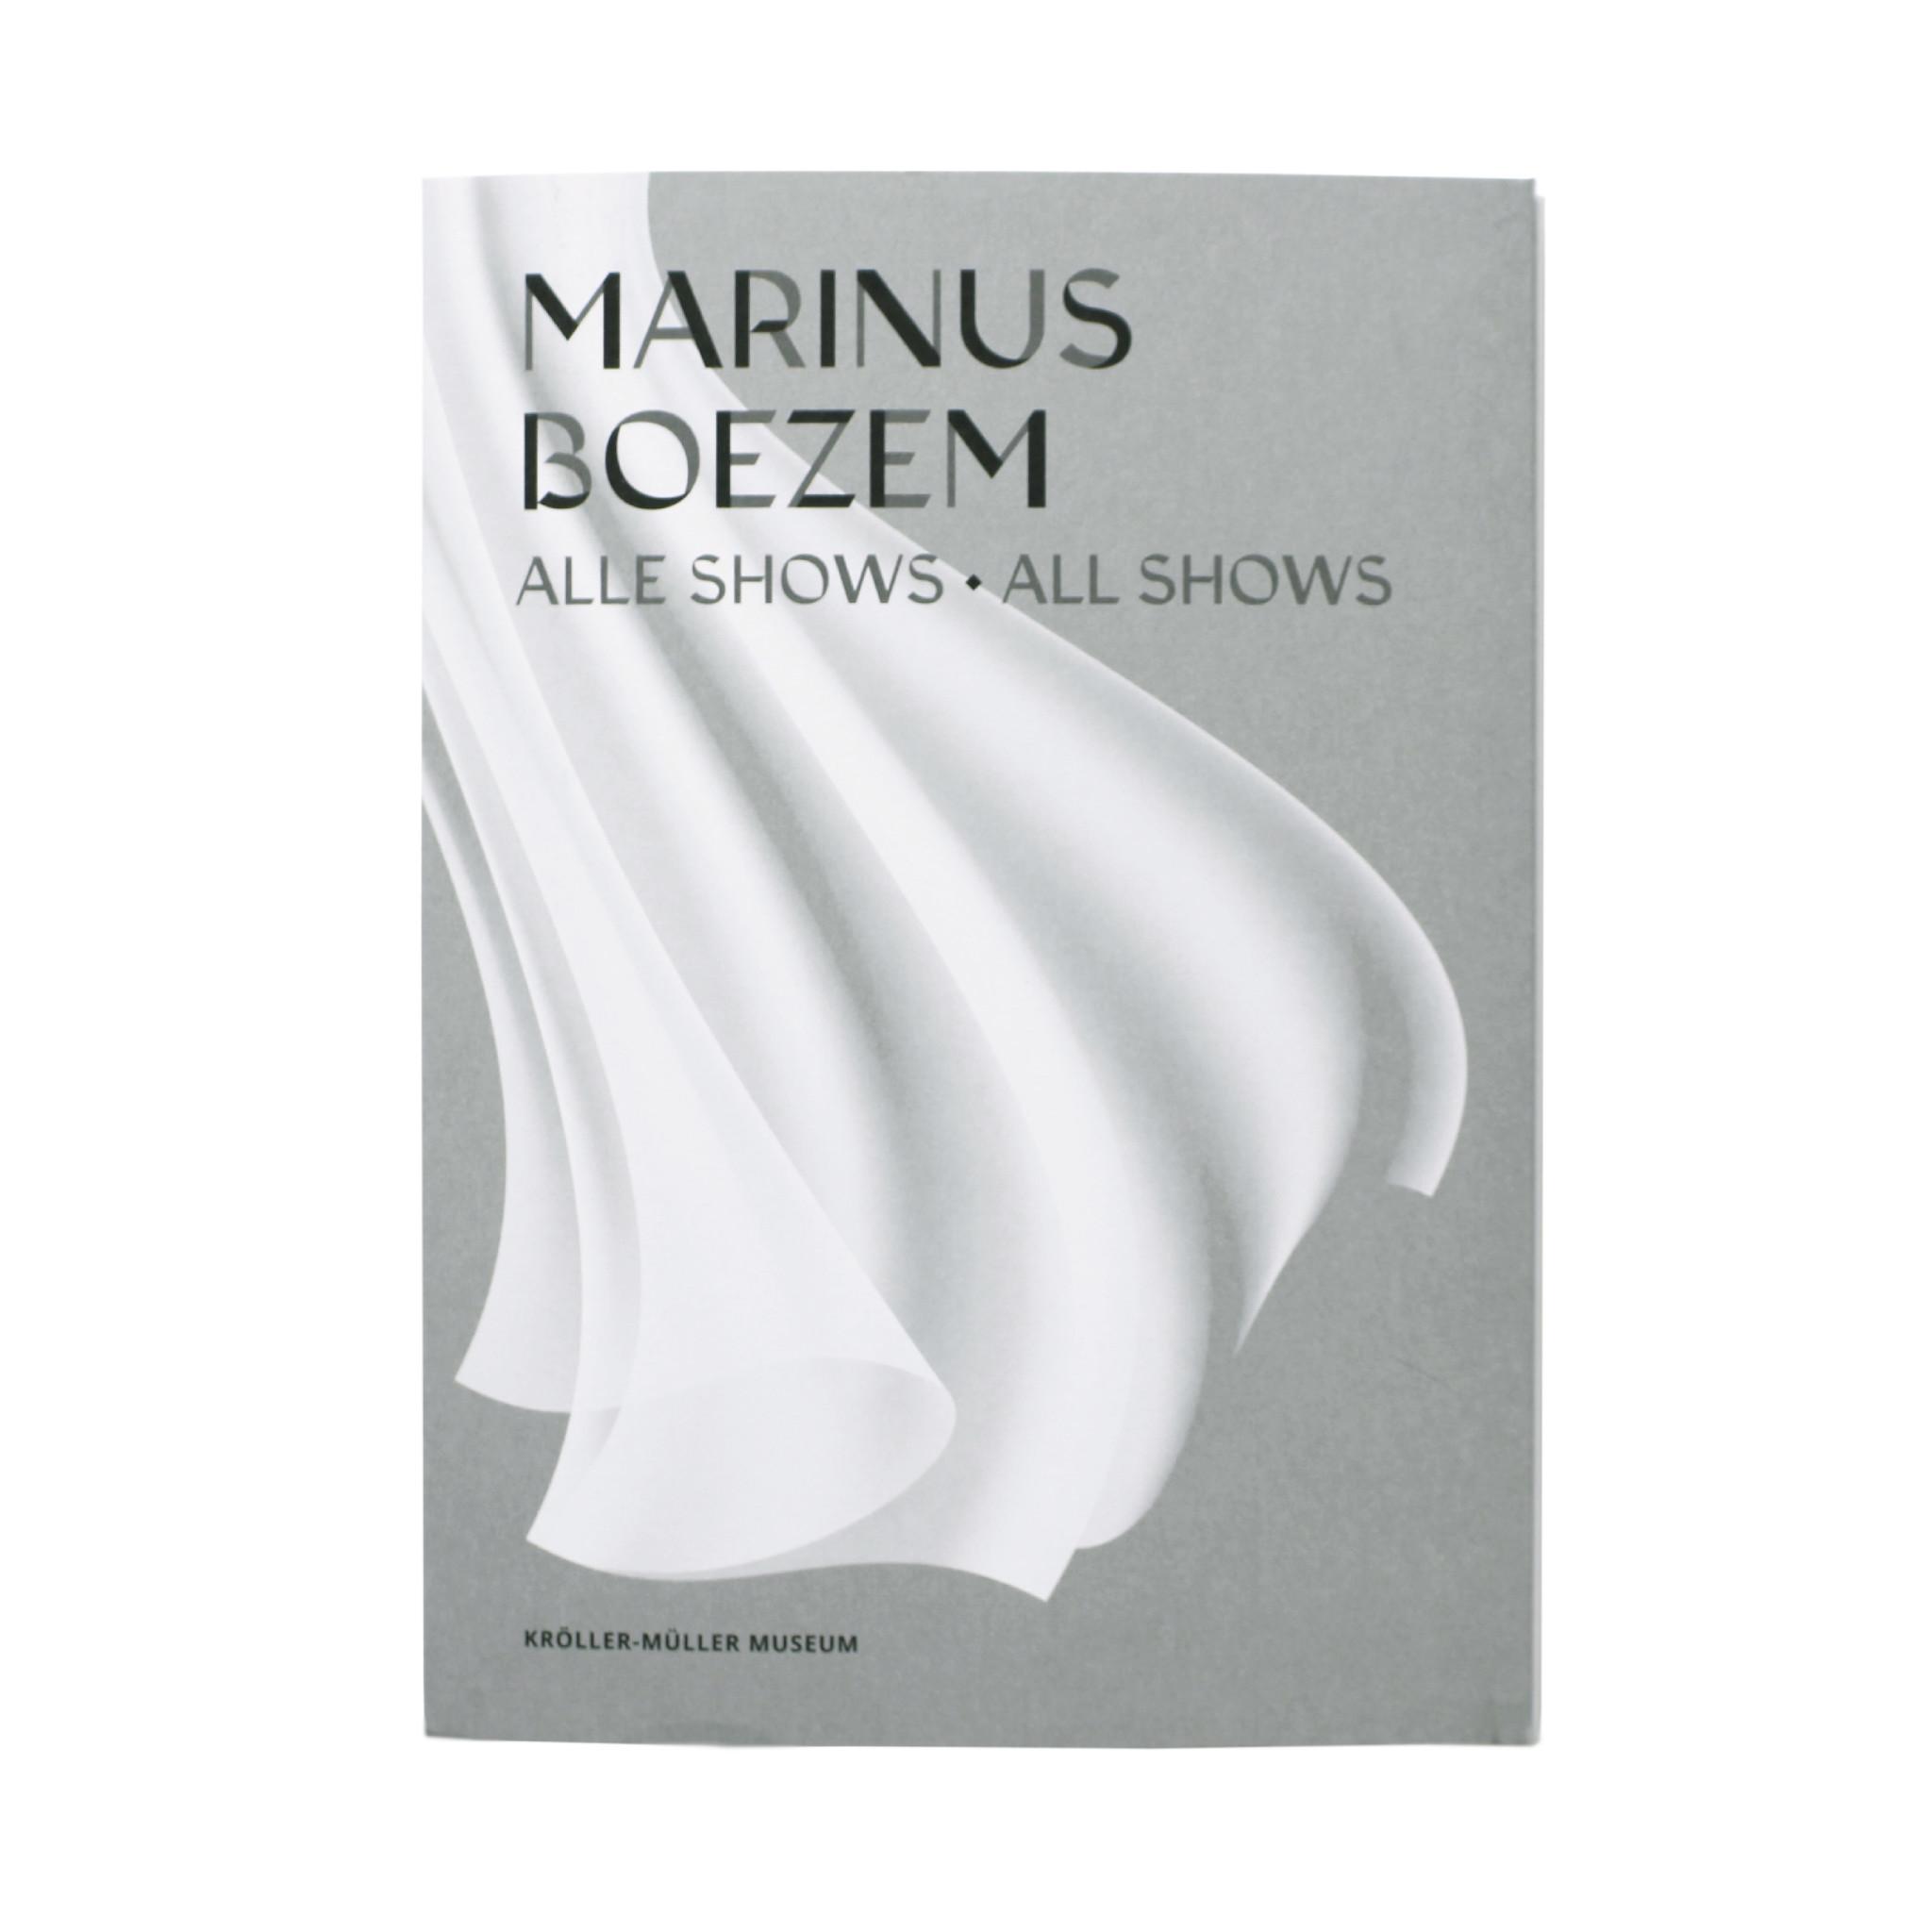 Marinus Boezem. All shows